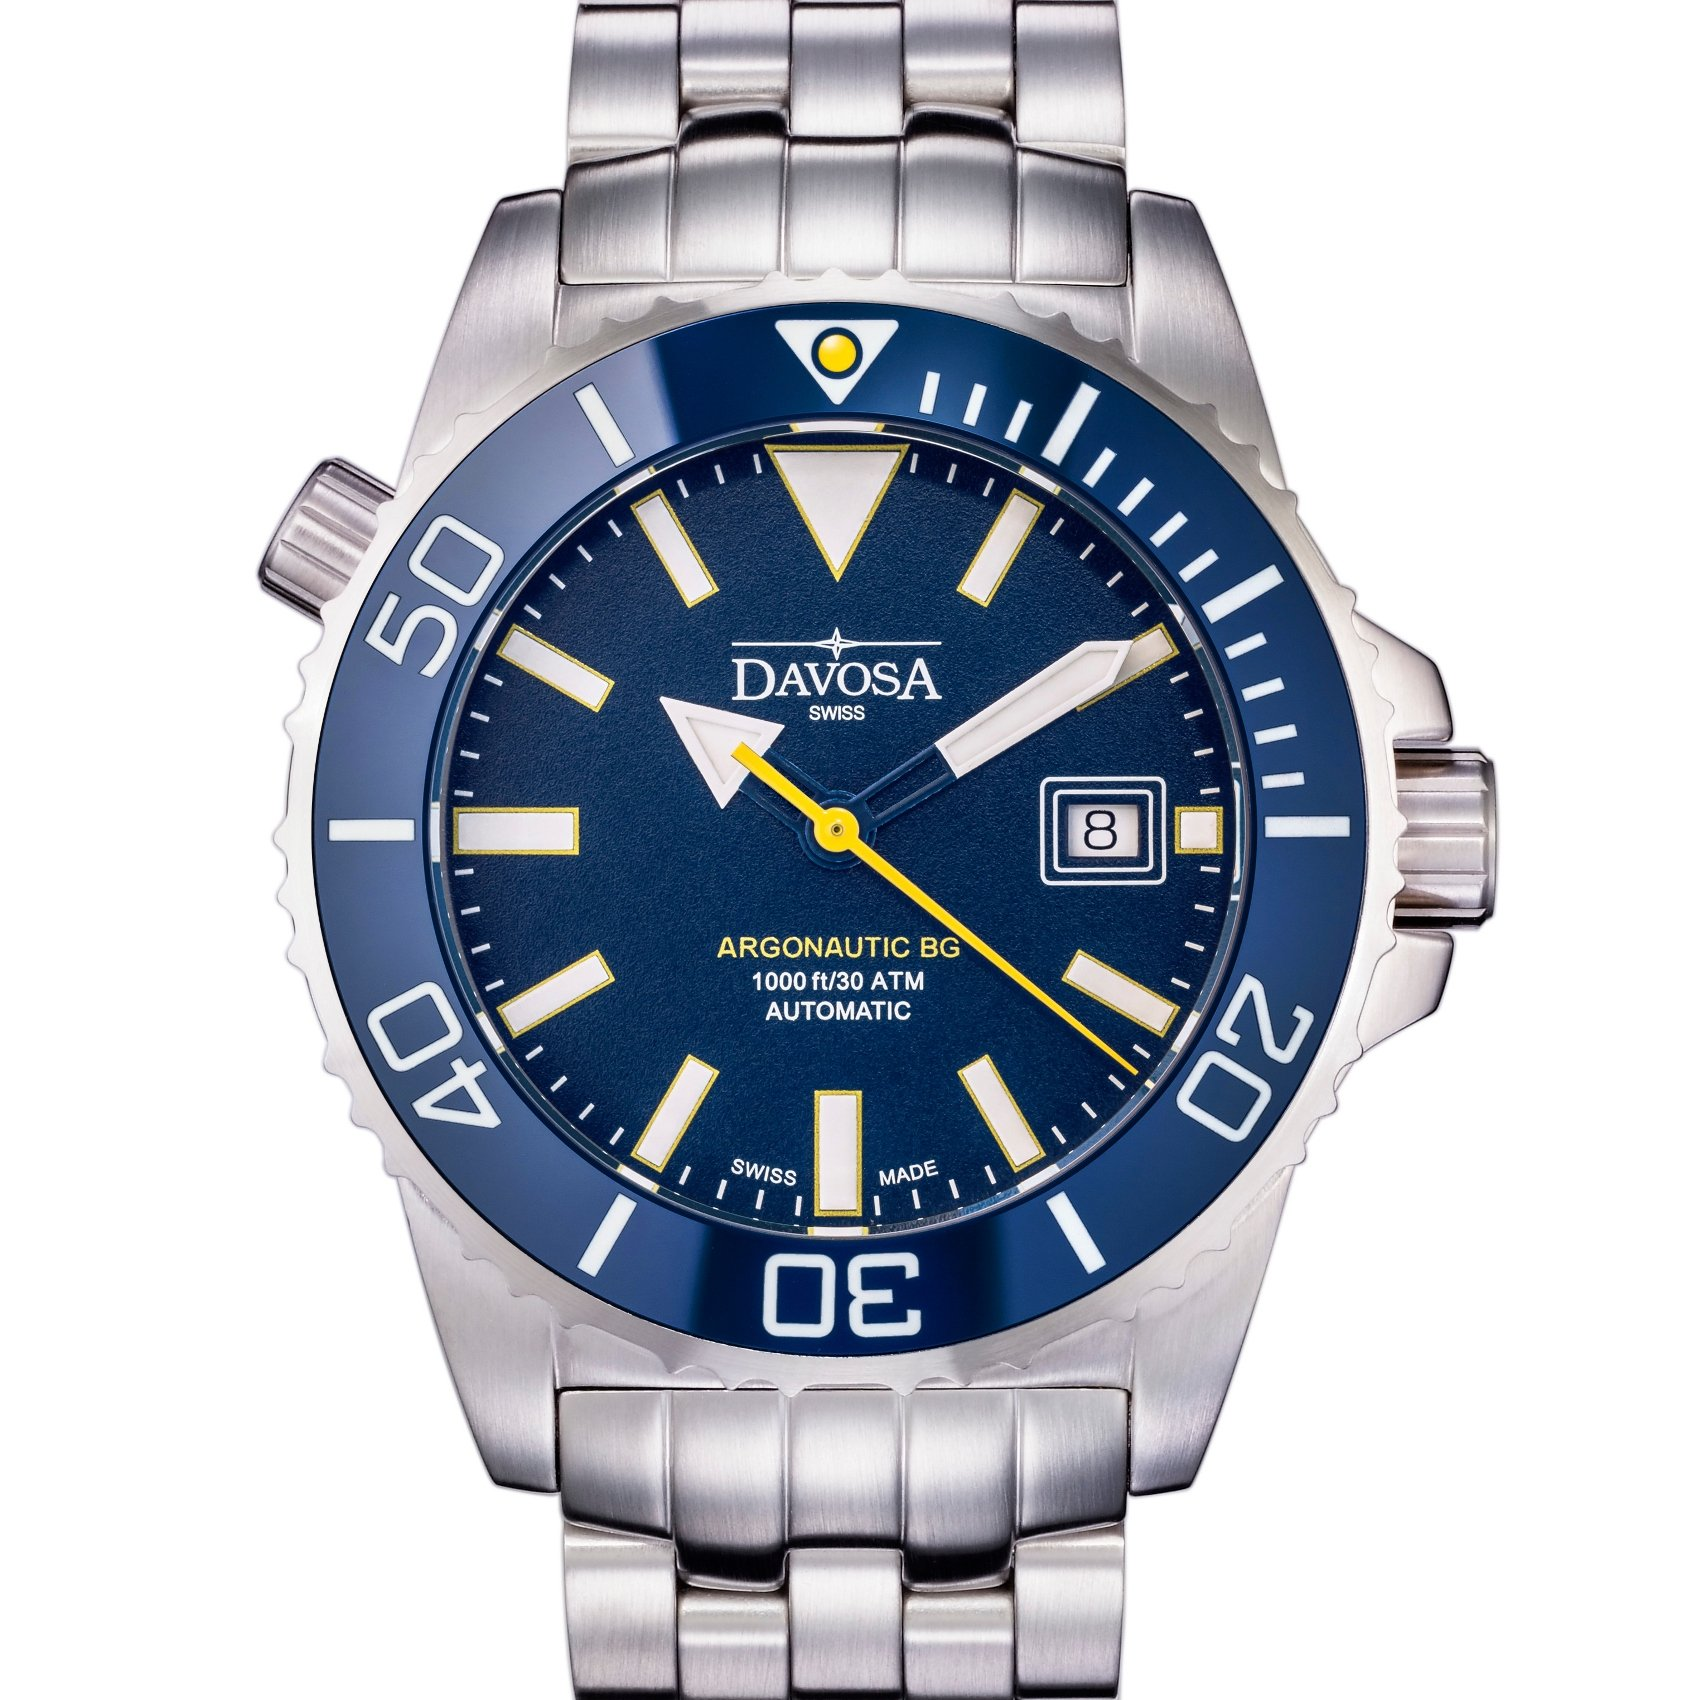 Davosa Automatic Swiss Made Men Watch, Professional Argonautic BG 16152240, Stainless Steel Wrist Band, Exceptional Luminous Analog Face